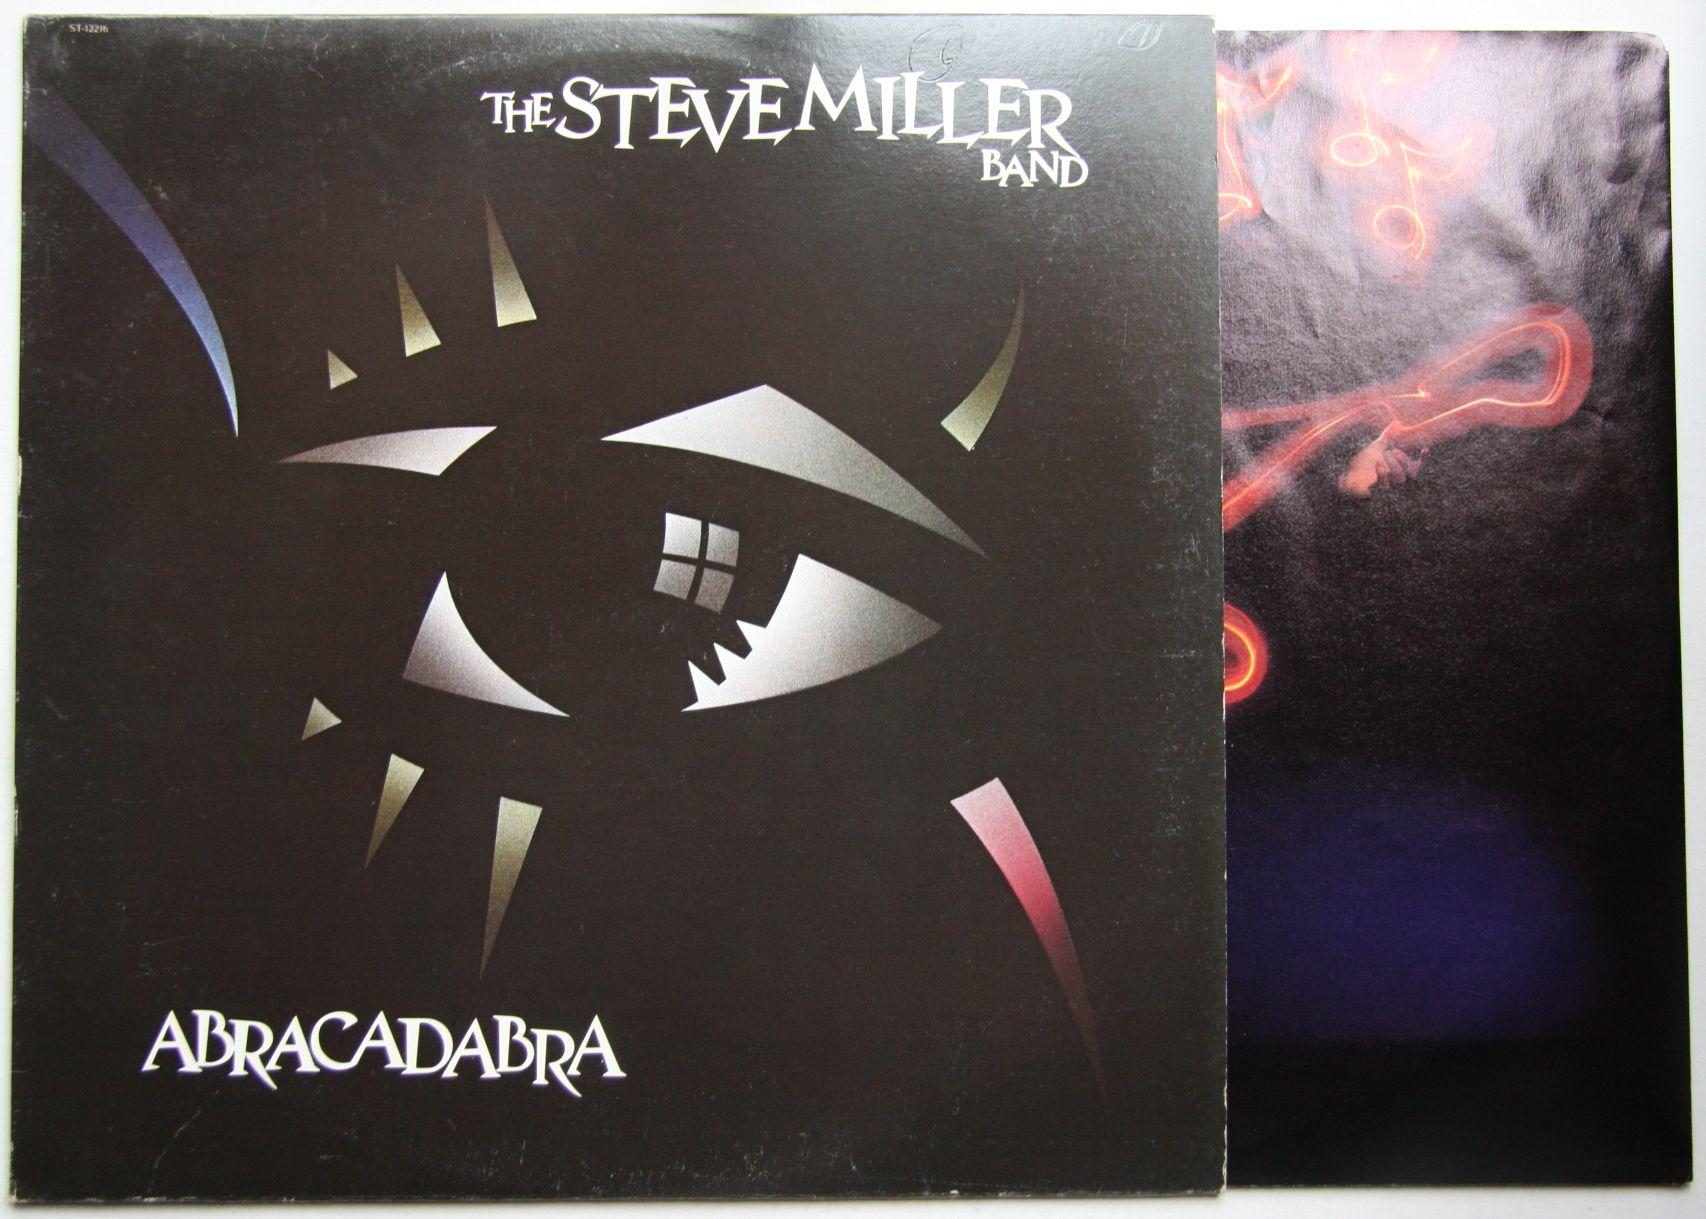 Steve Miller - Abracadabra EP